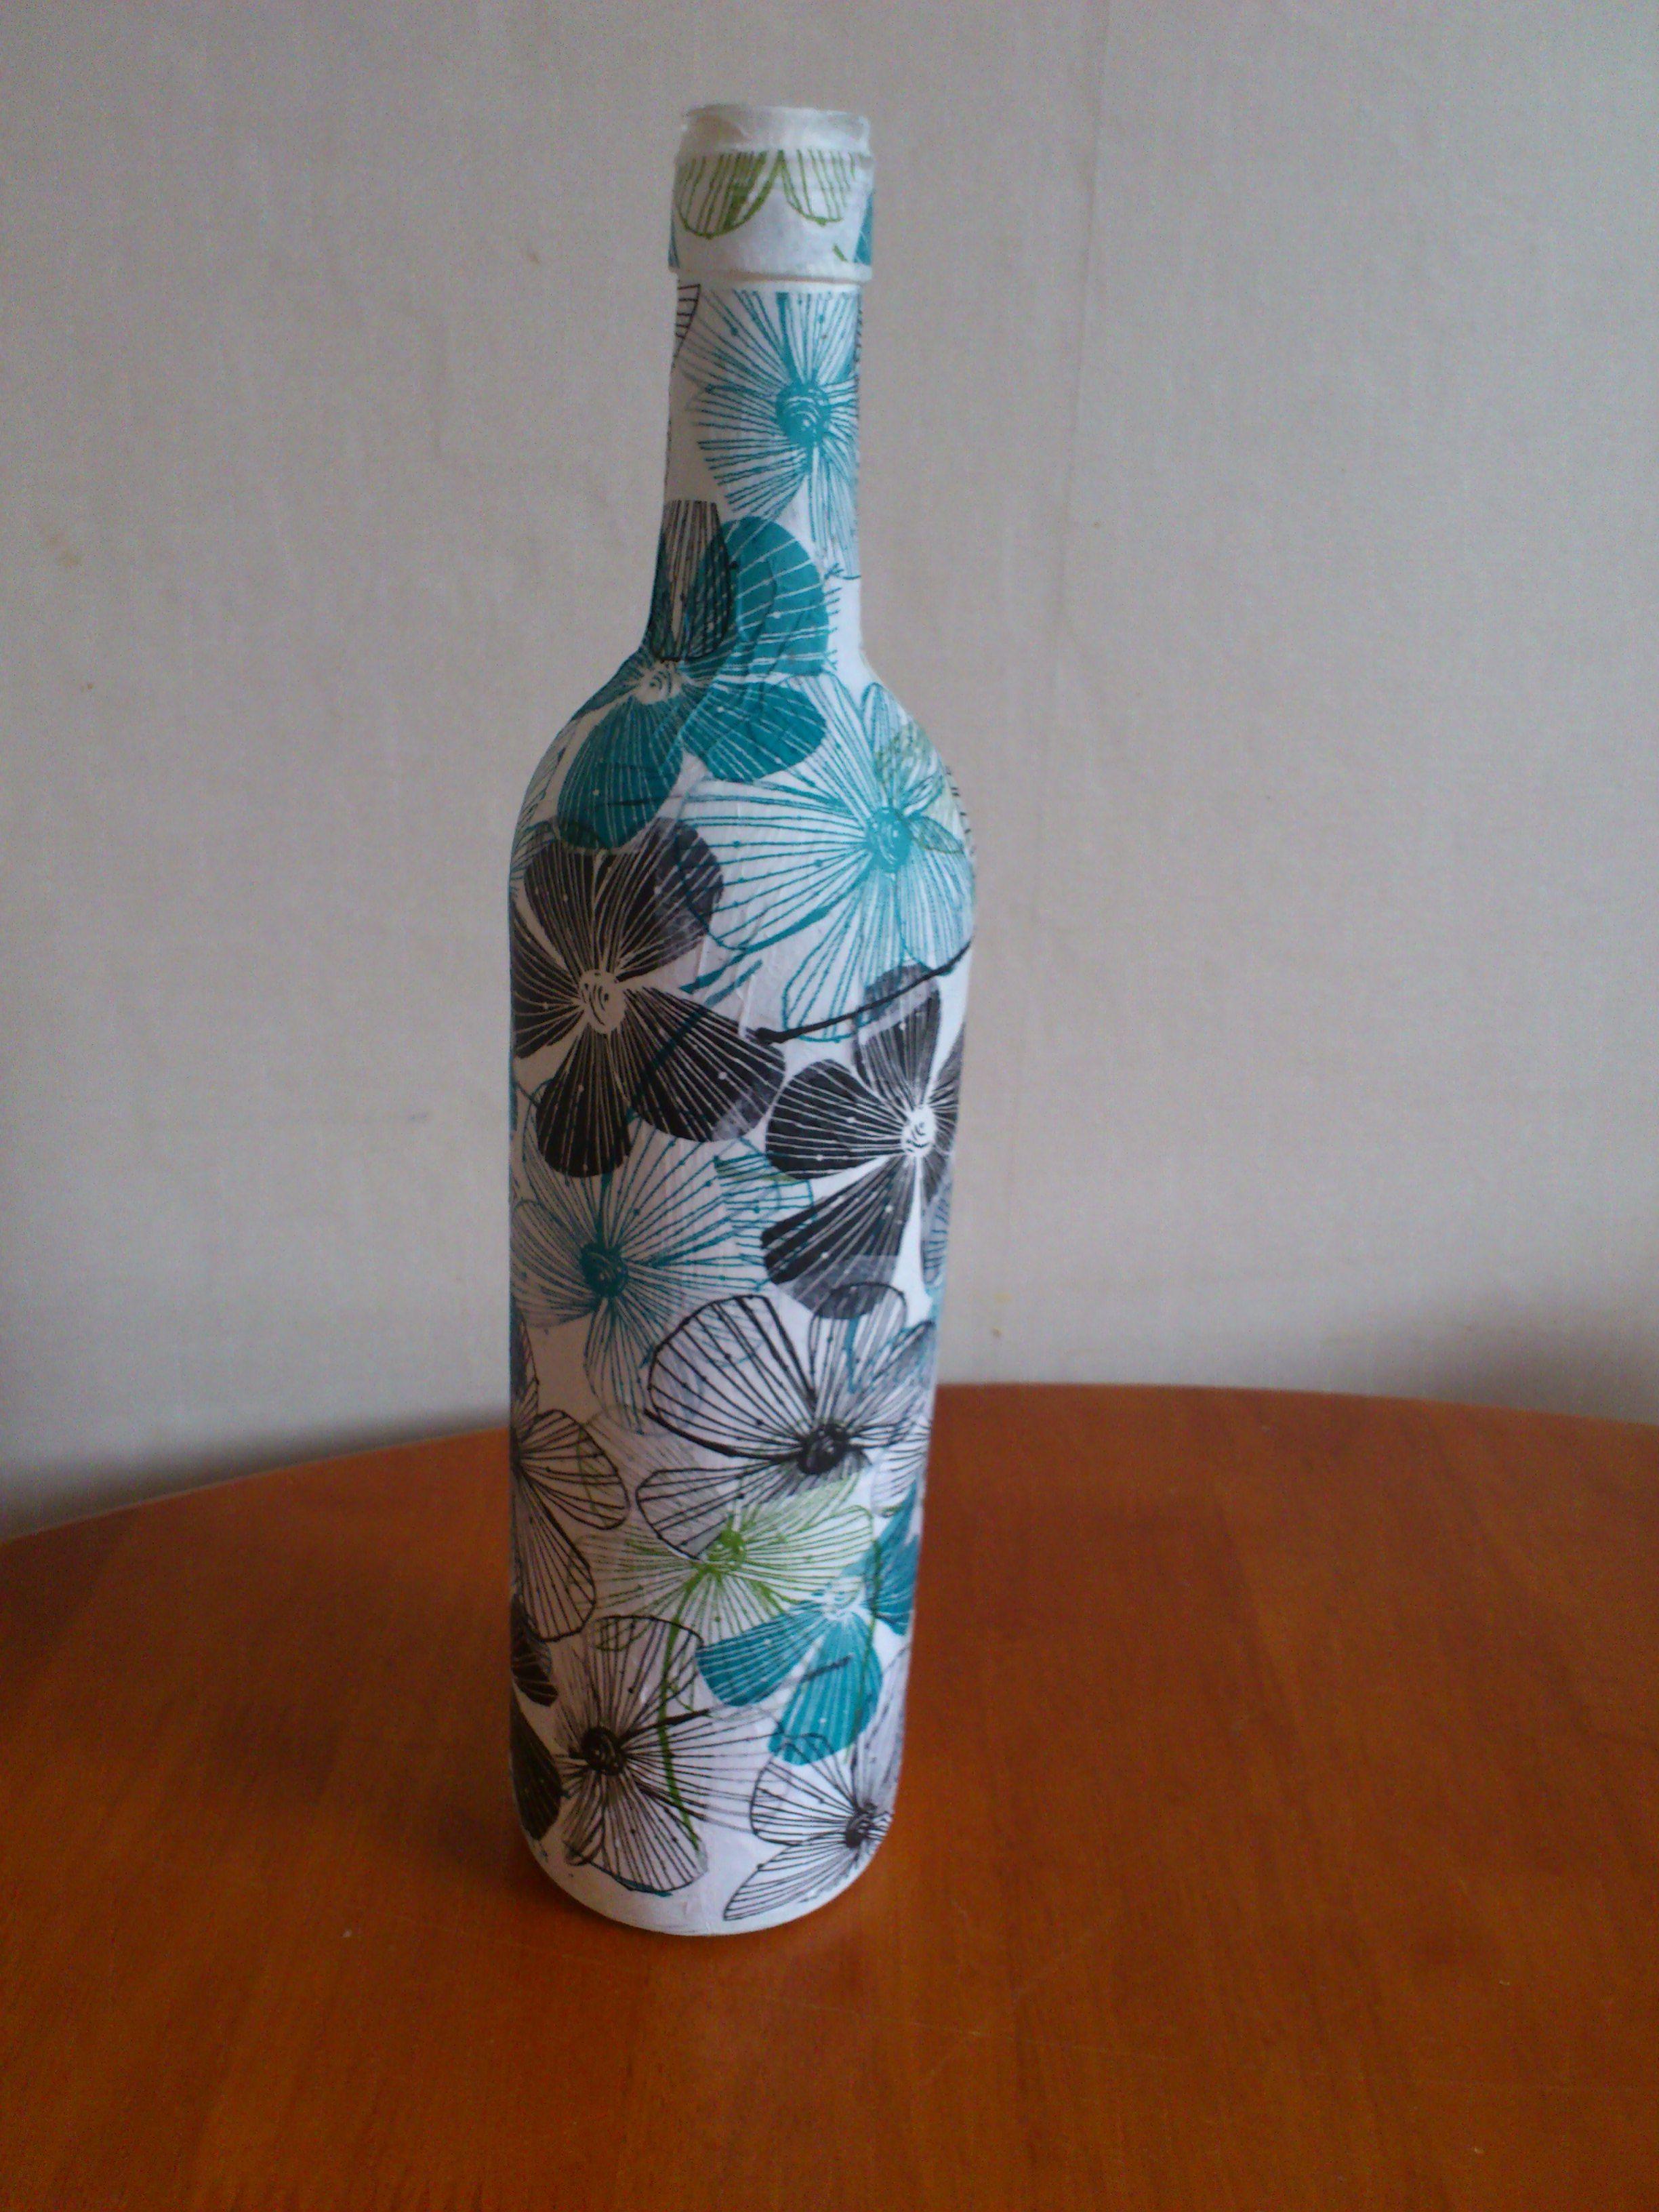 Diy wine bottle using pva glue and tissue paper artsy for Wine bottle glasses diy